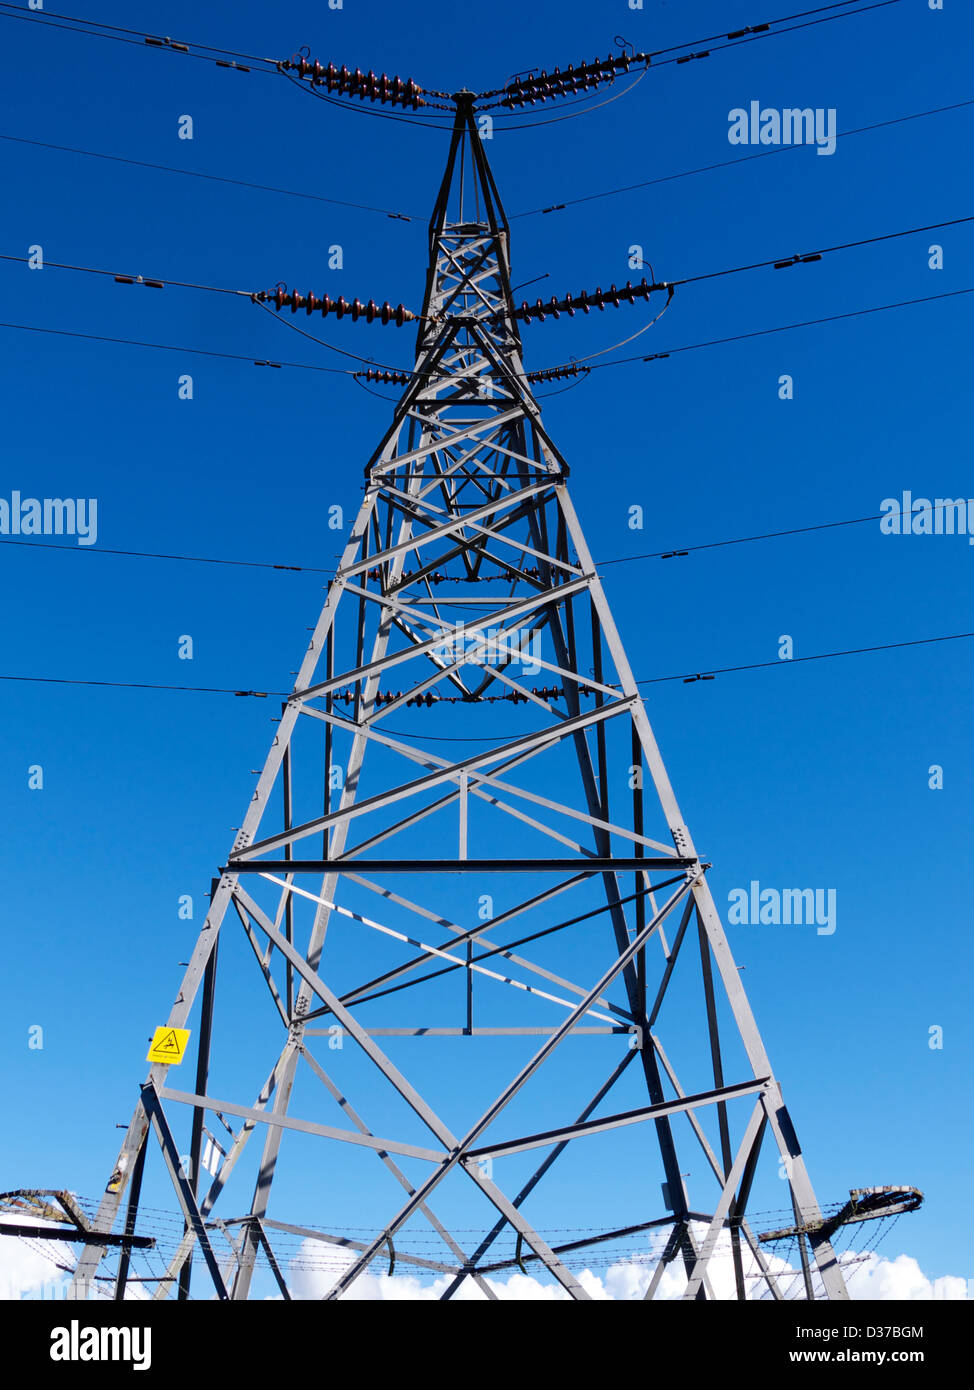 A electricity pylon against a blue sky - Stock Image